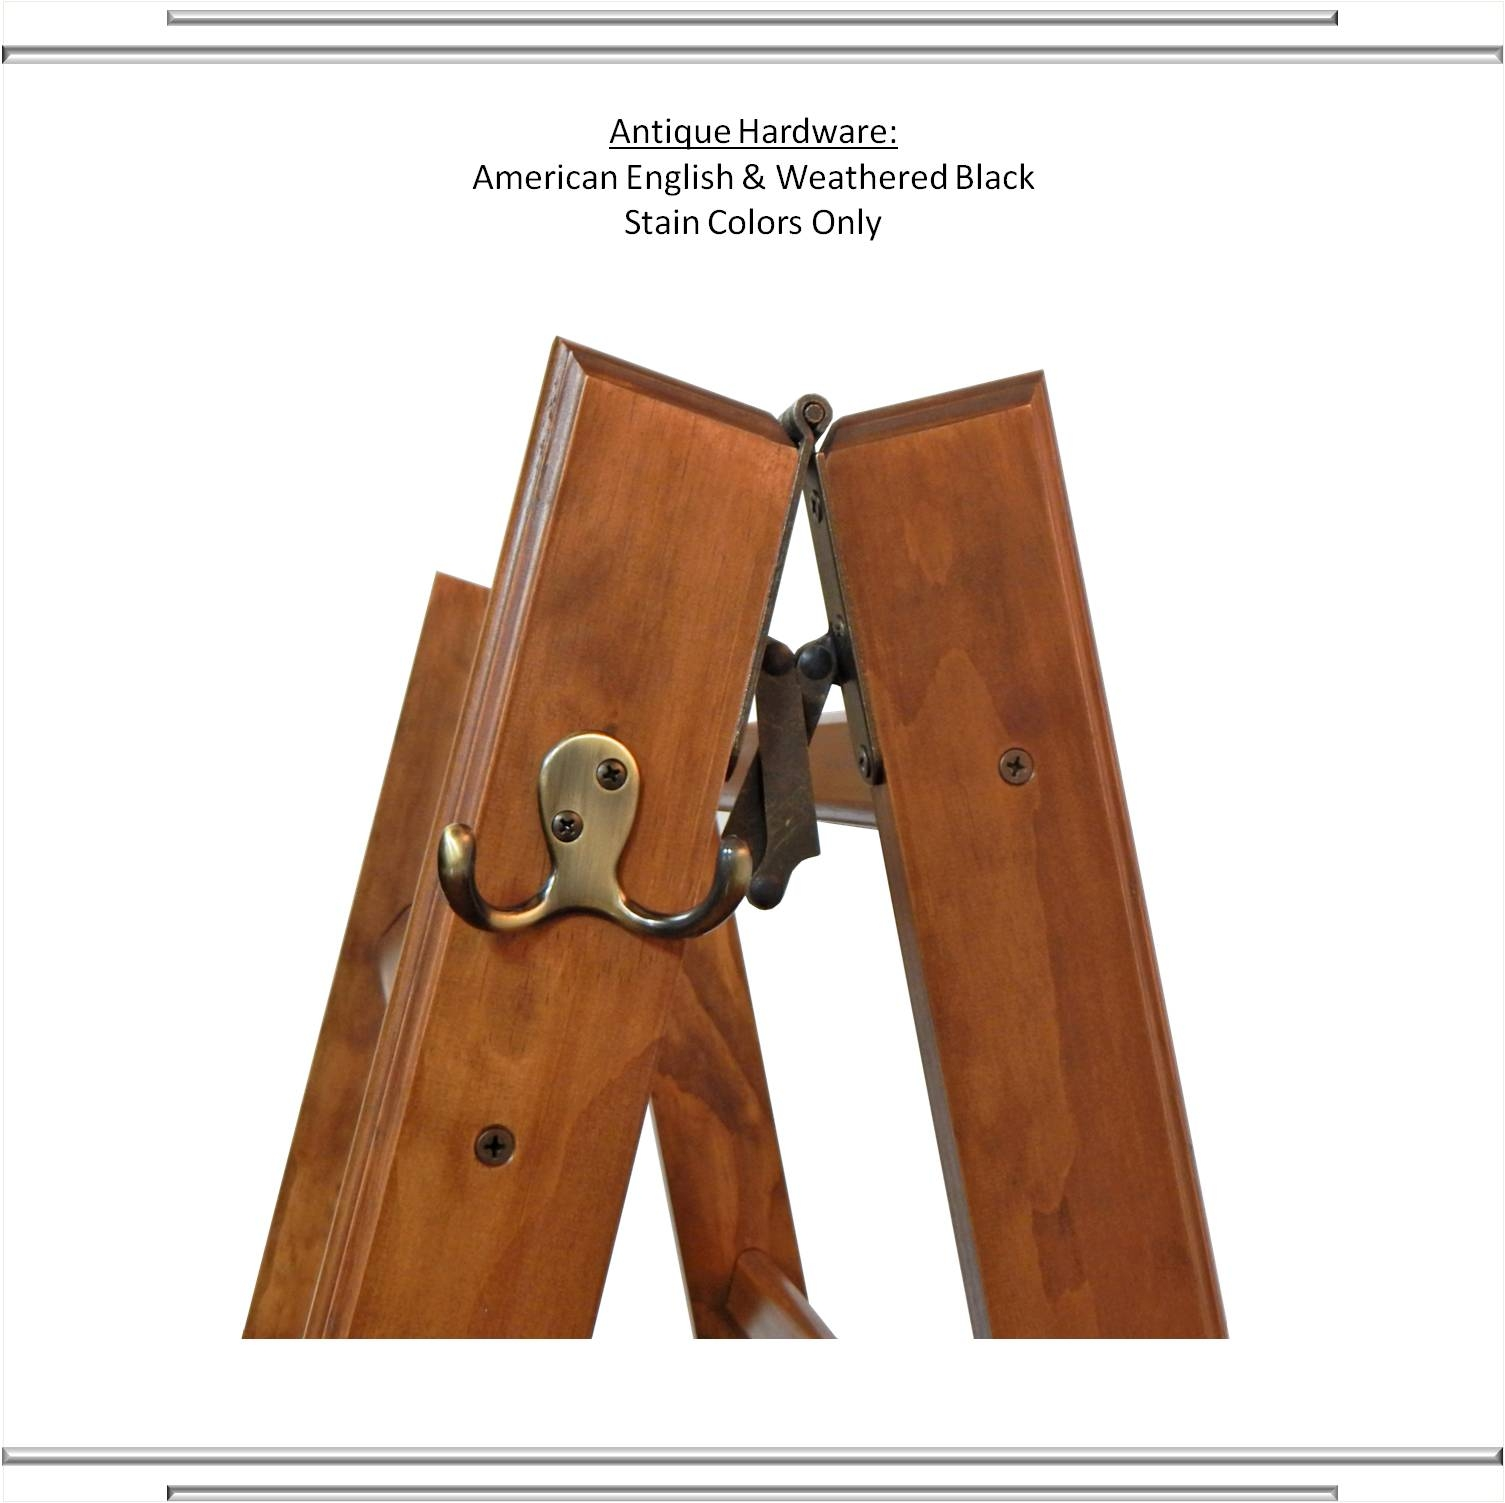 The LadderRack: Handcrafted Wood Quilt Ladder Display Rack : quilt display racks - Adamdwight.com